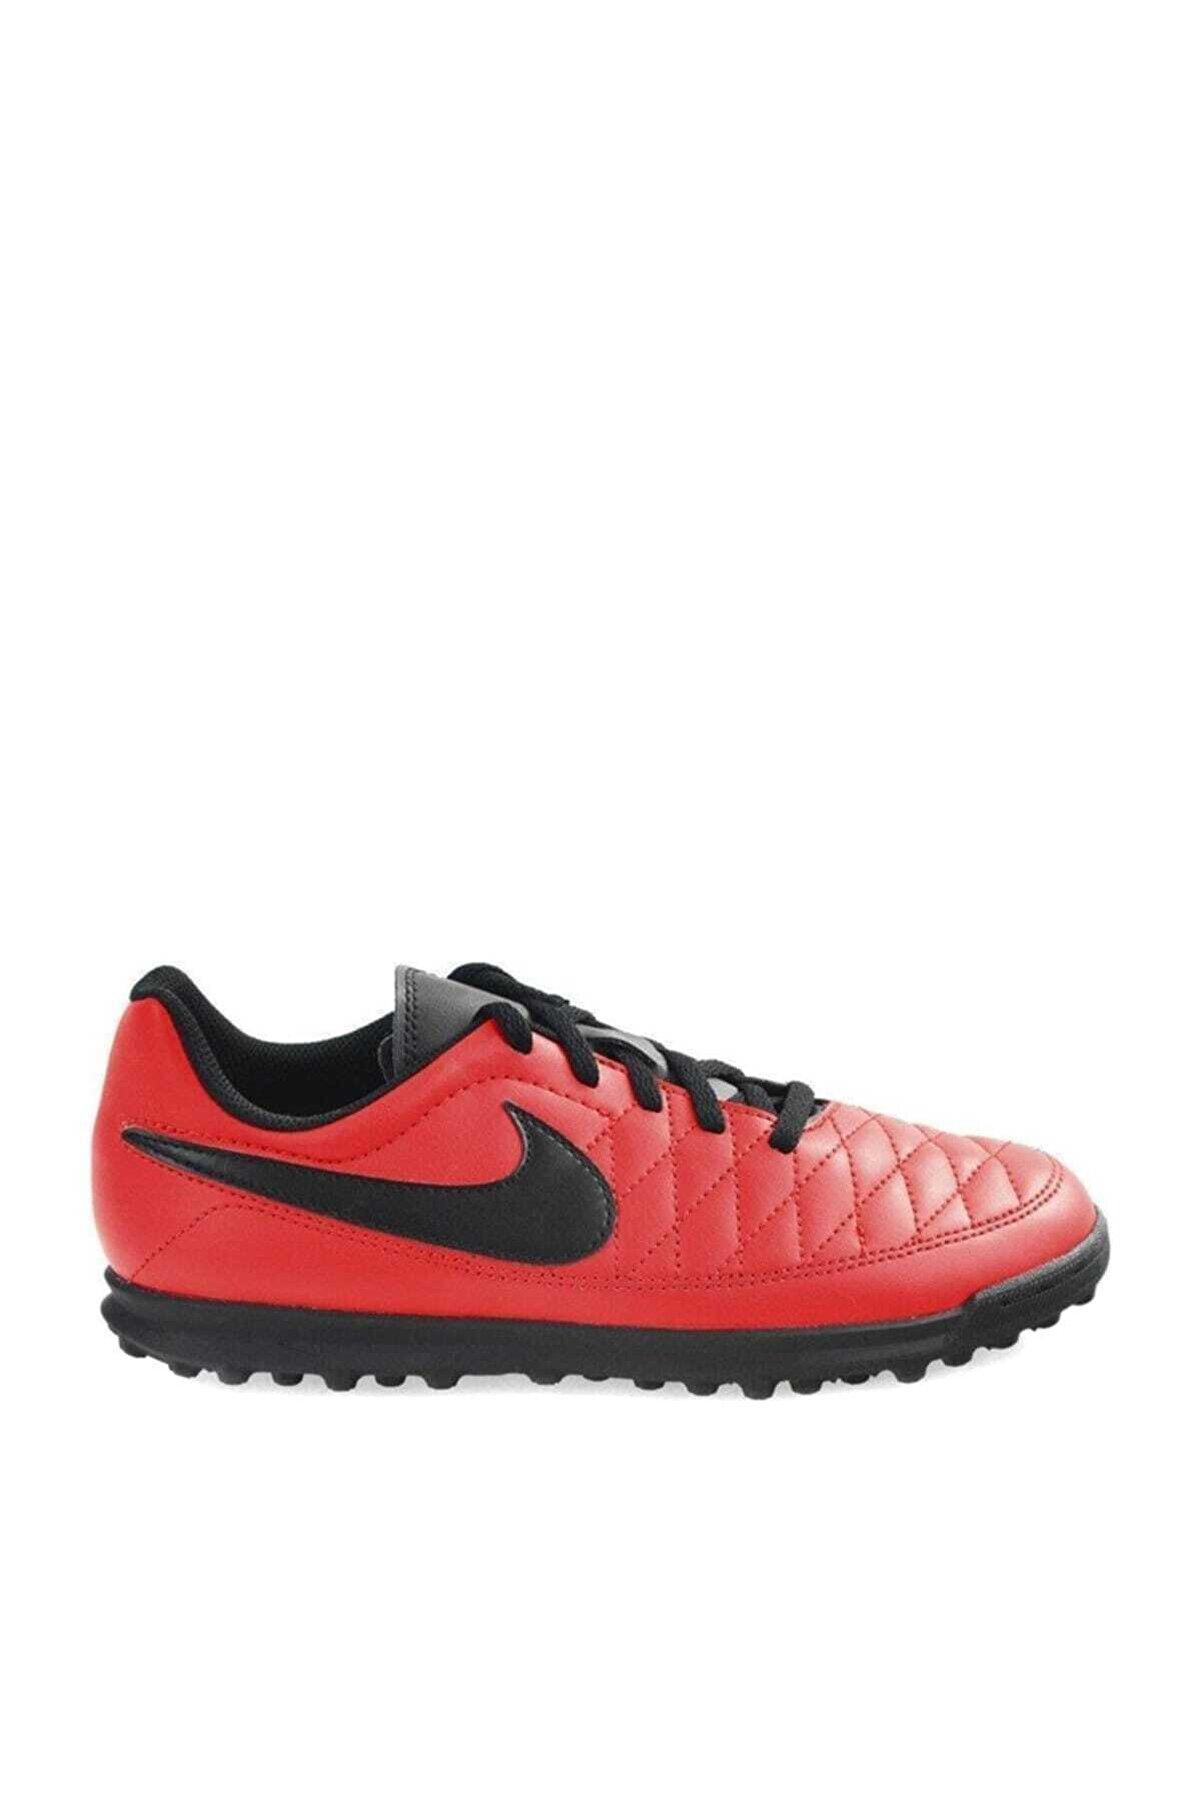 Nike Unisex Futbol Ayakkabı - Jr Majestry Tf - Aq7896-600